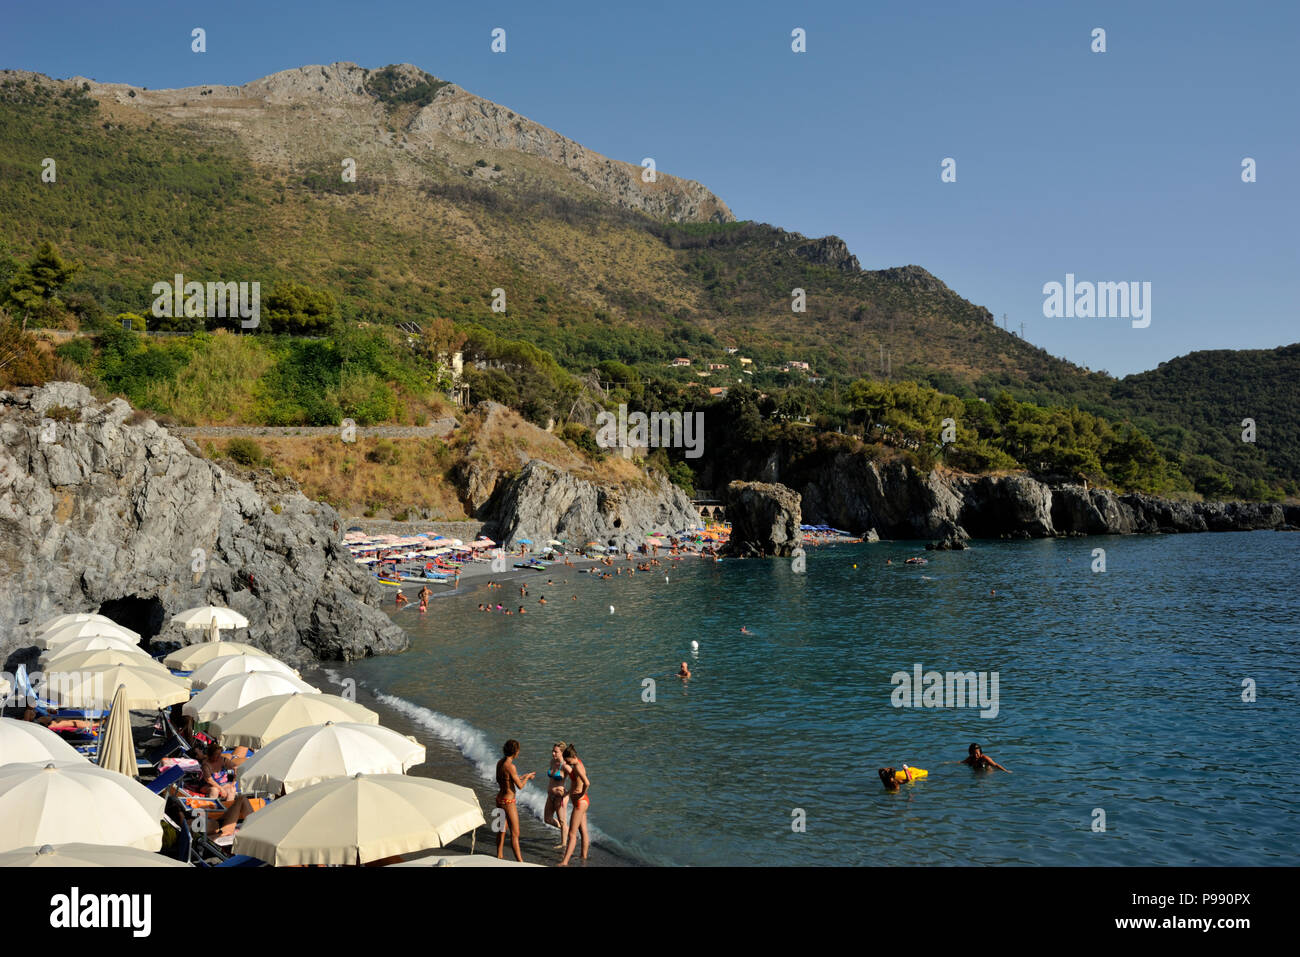 italy, basilicata, maratea, santa teresa beach Stock Photo